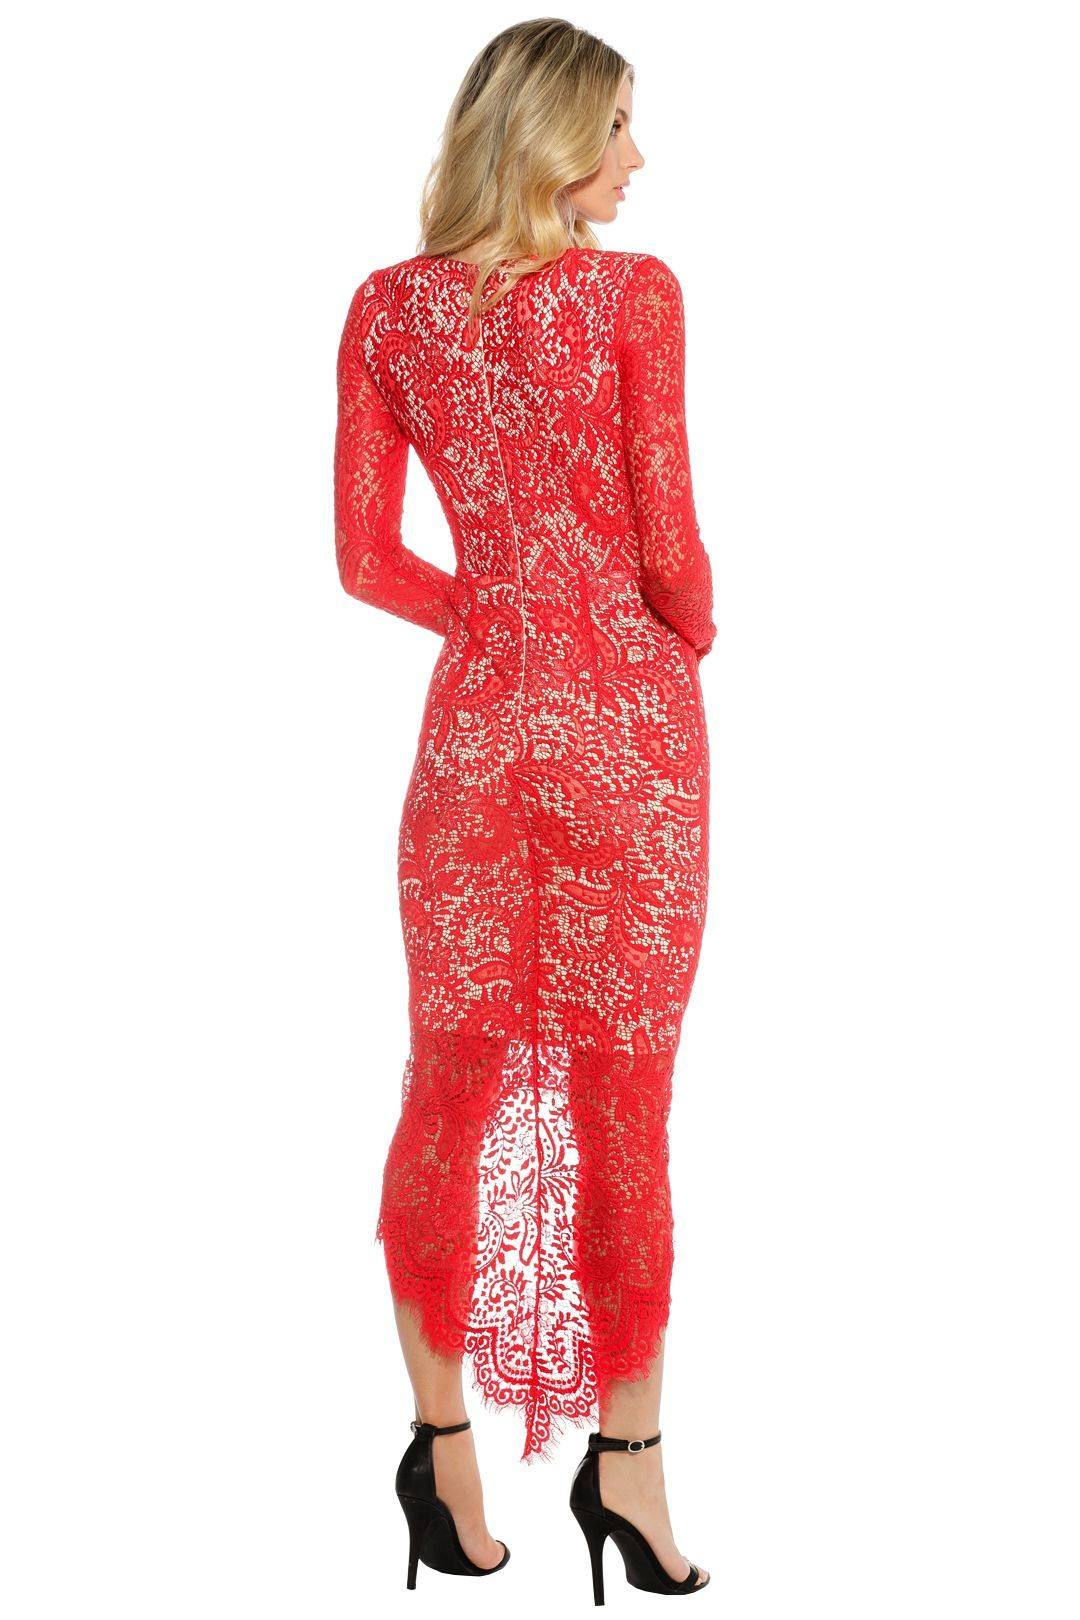 Elle Zeitoune - Cameron Dress - Red - Back